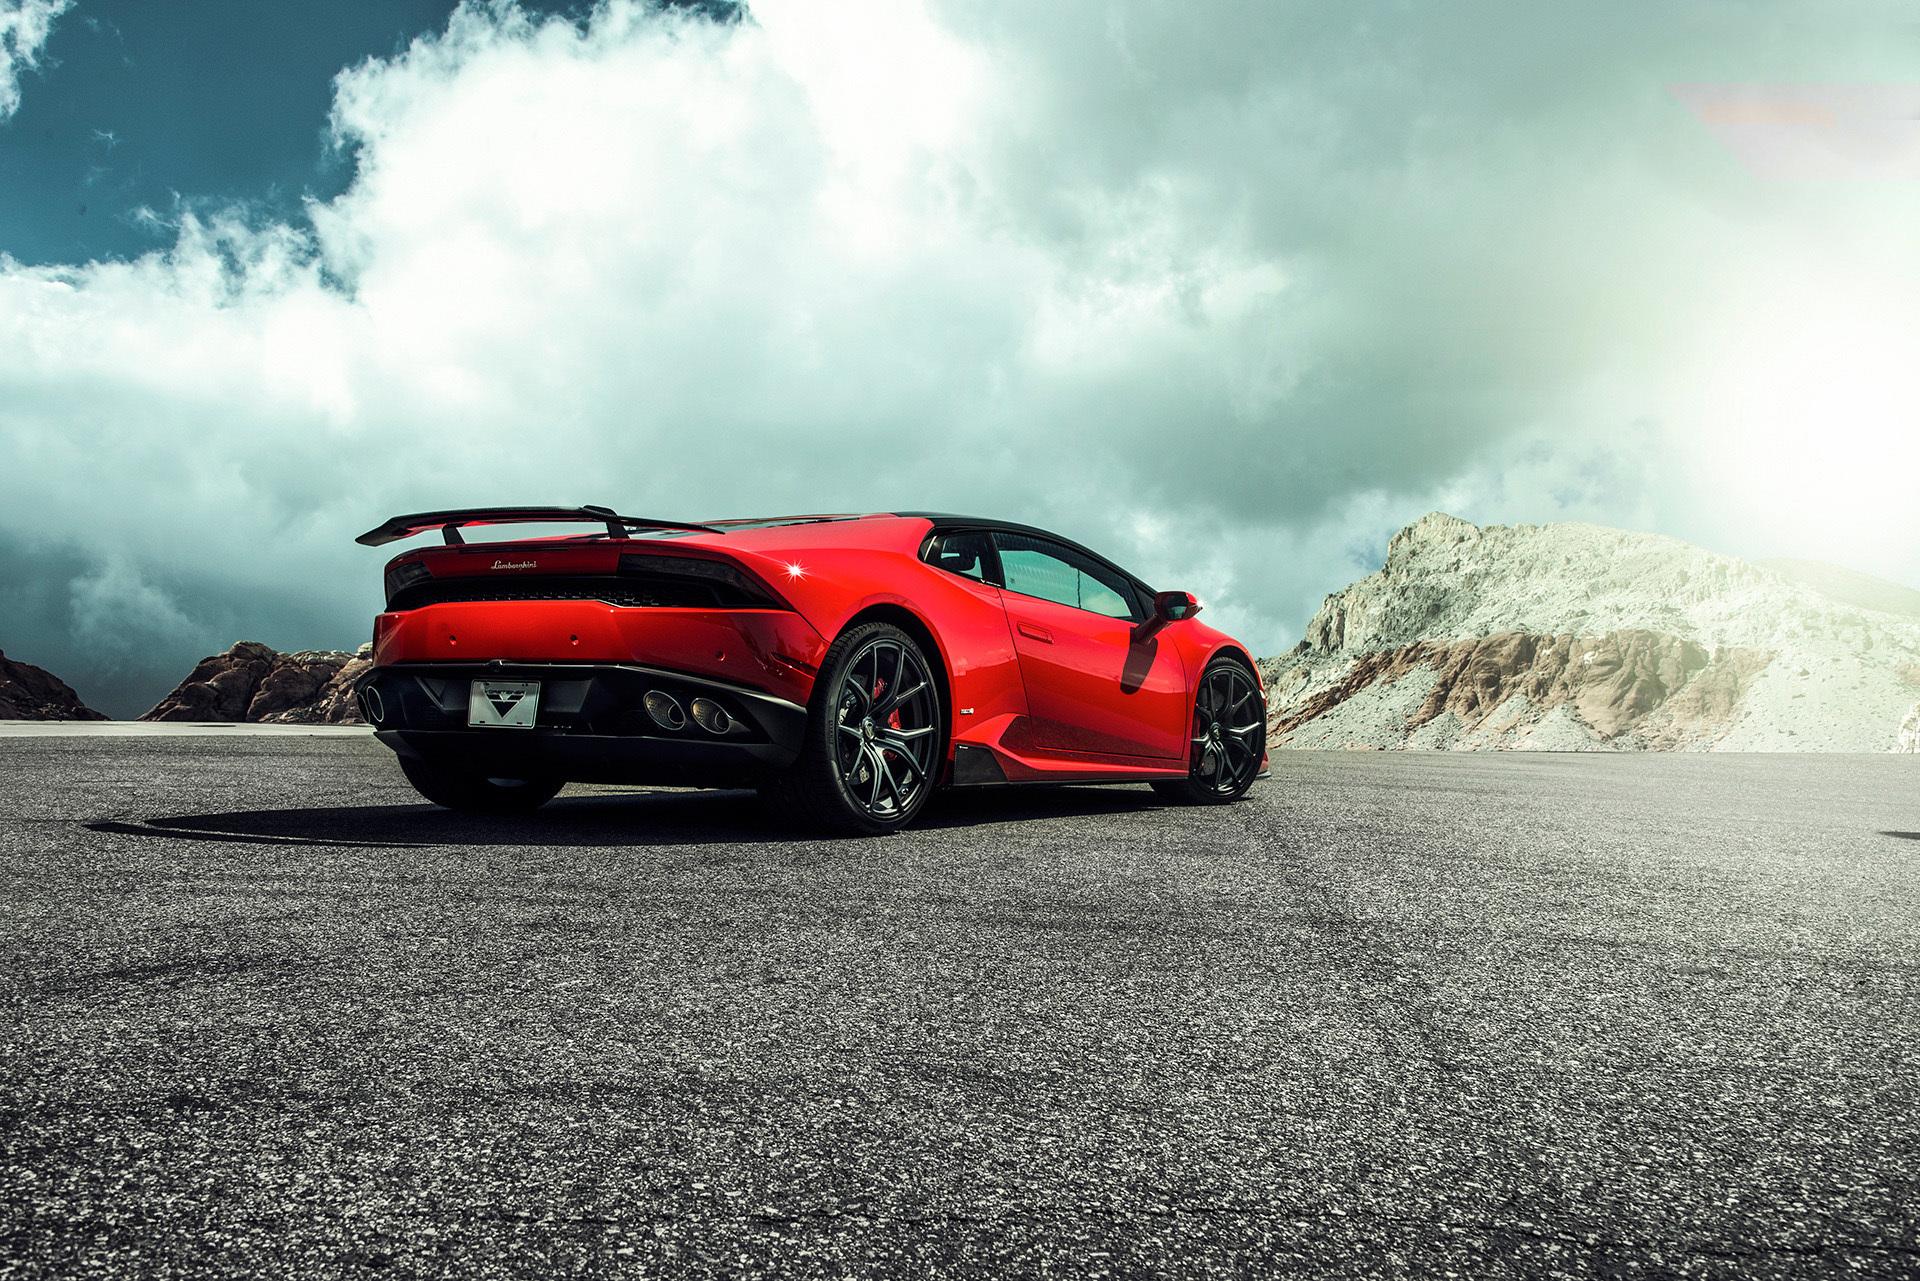 Vorsteiner Nero body kit for Lamborghini Huracan Verona carbon fiber